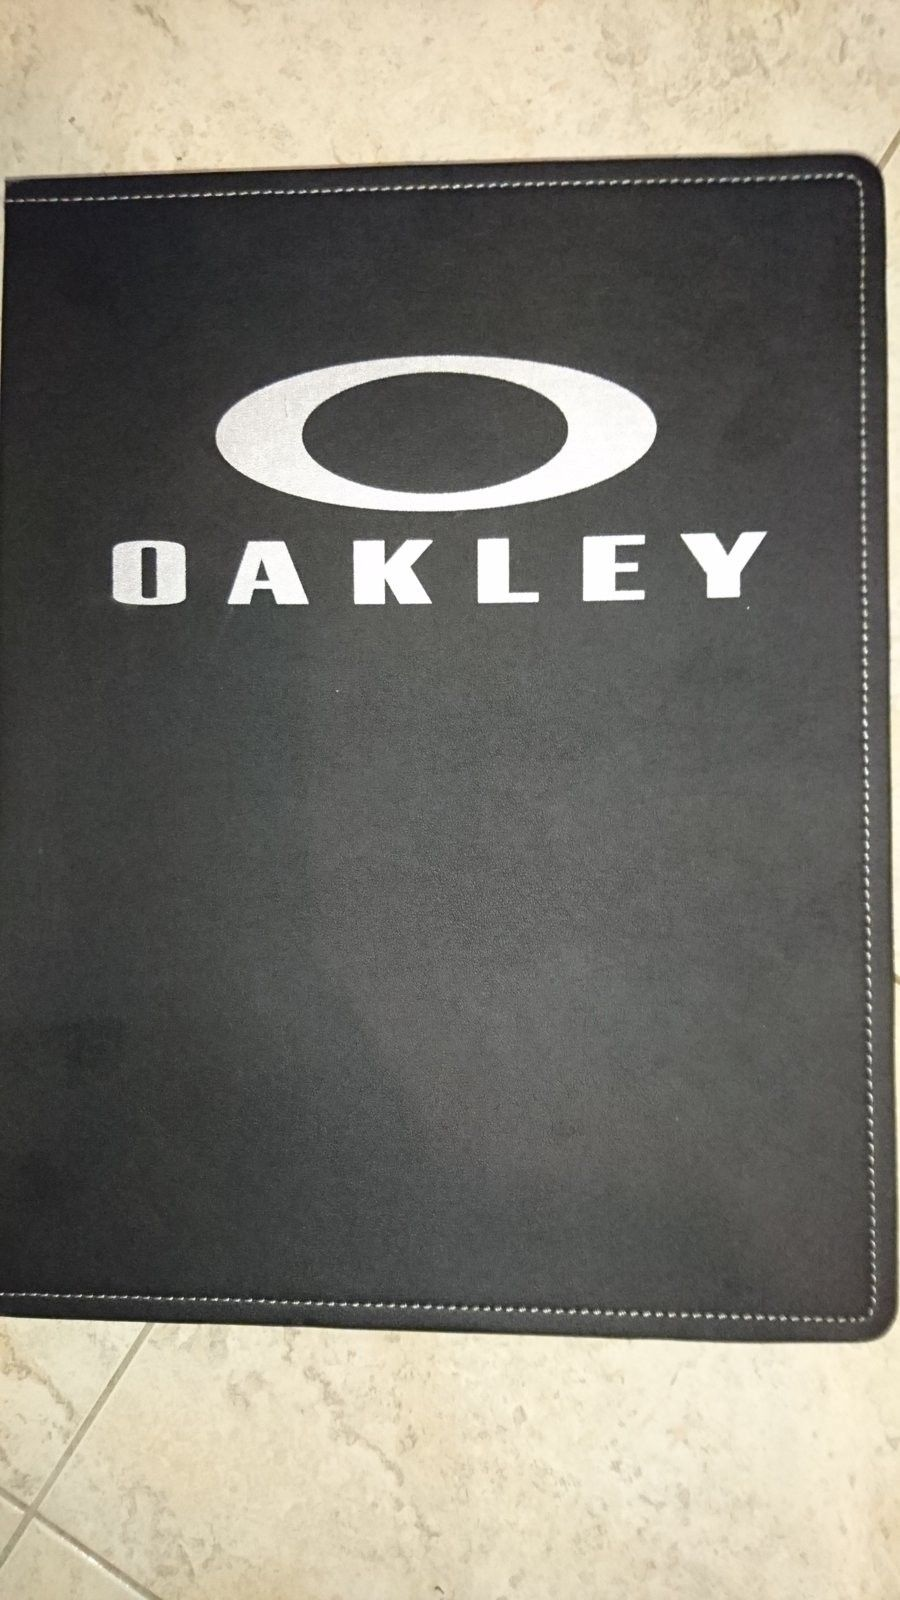 WTB Oakley lens book - 2016-02-23 19.00.34.jpg